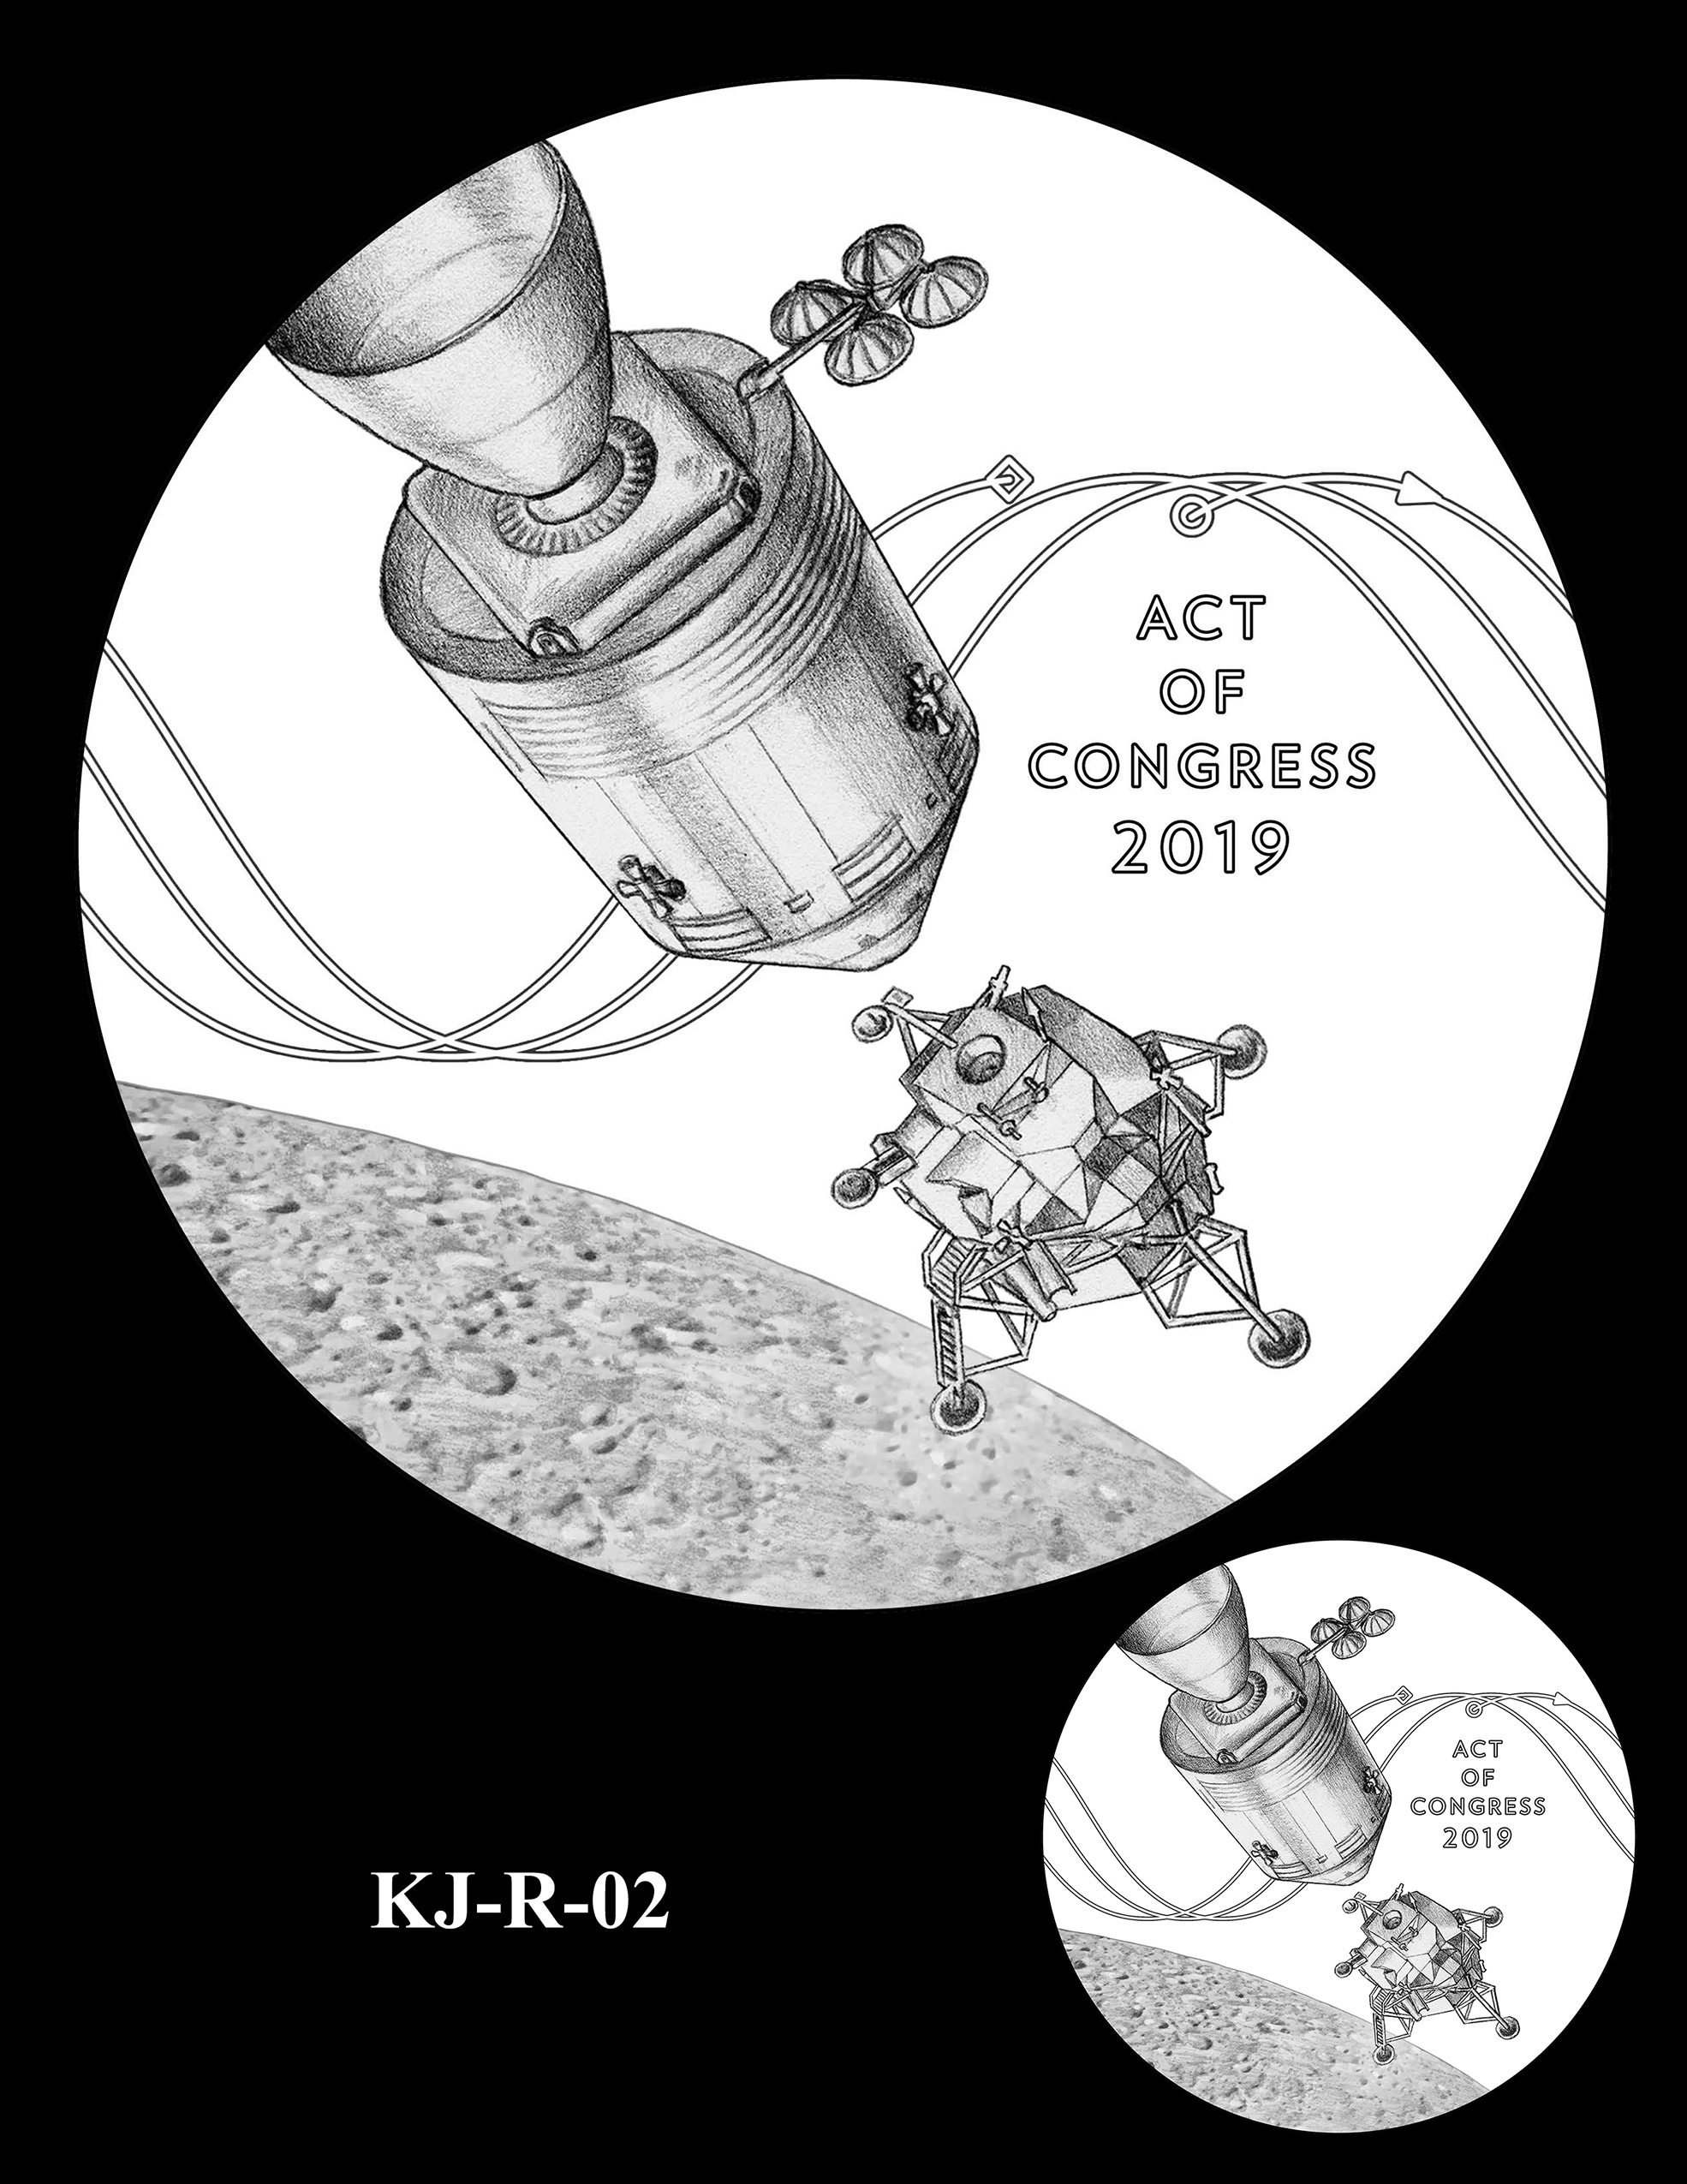 KJ-R-02 -- Katherine Johnson Congressional Gold Medal